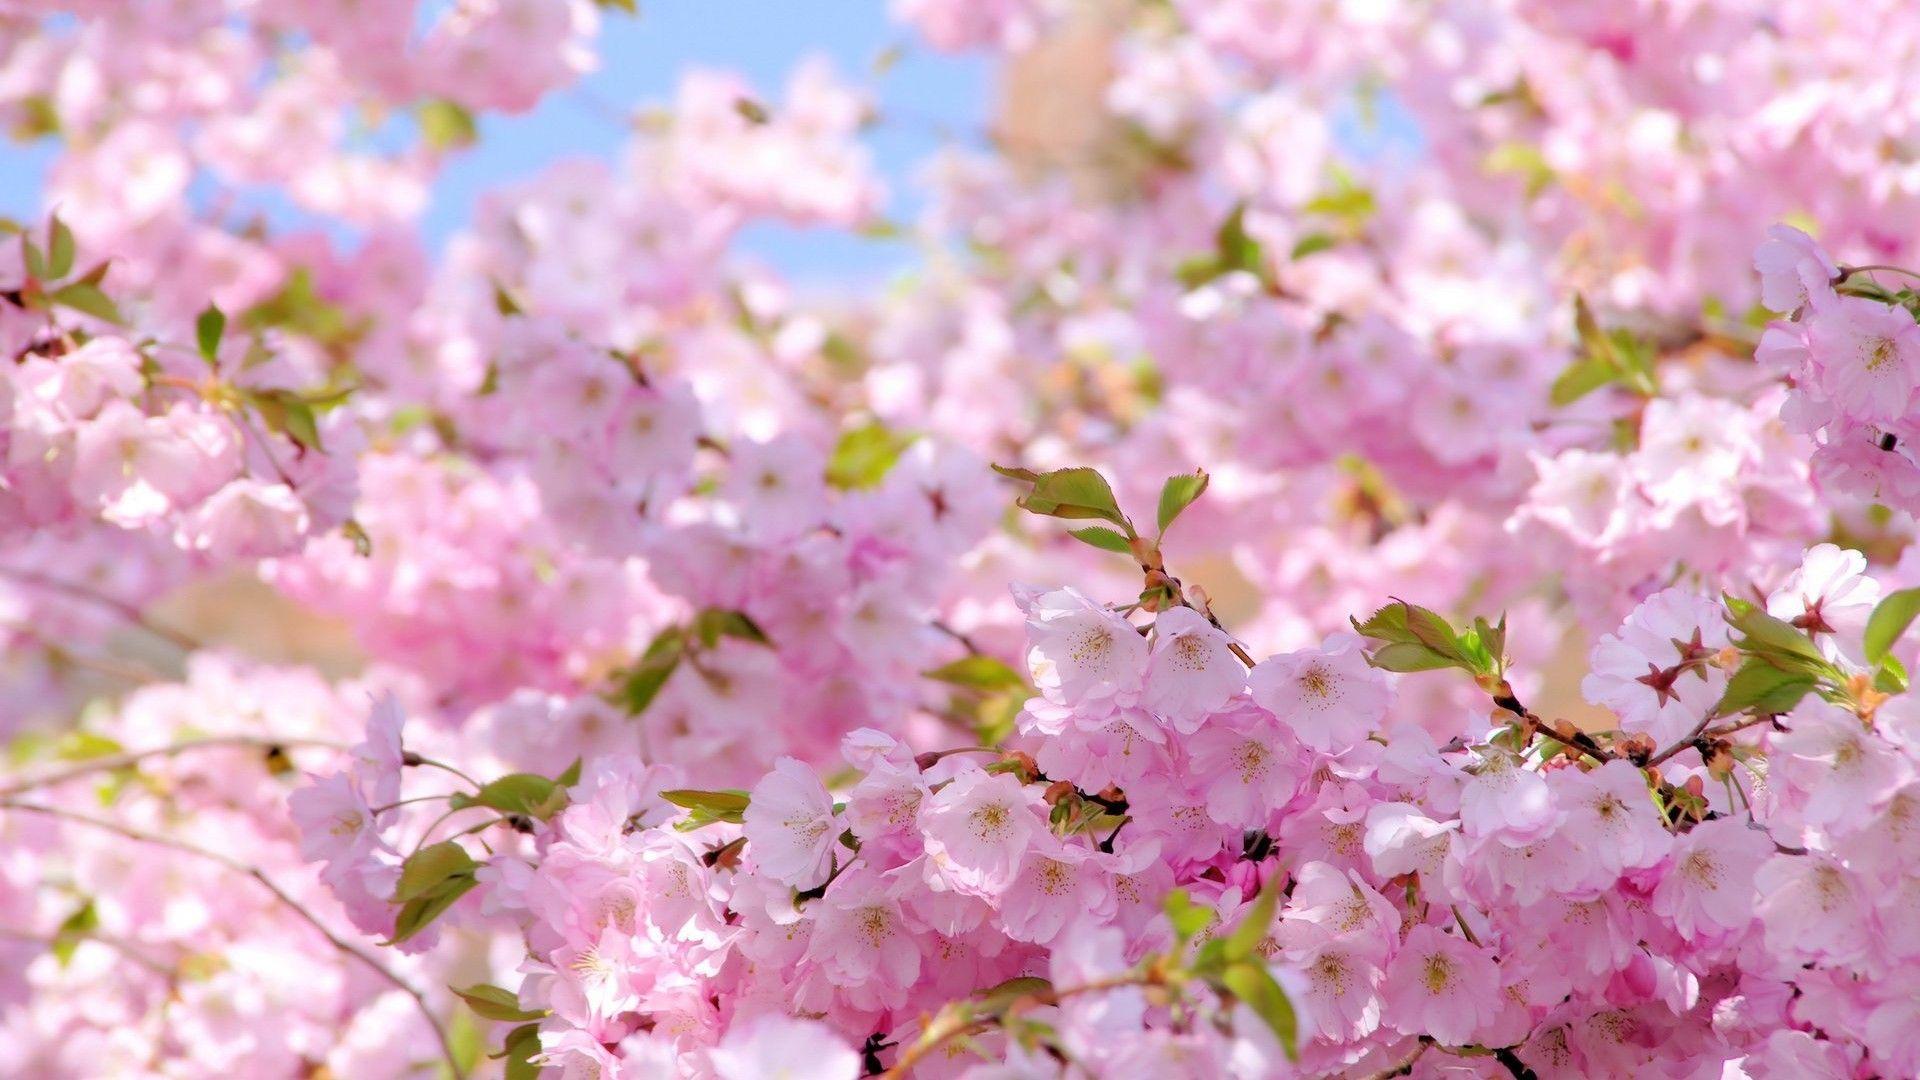 Wallpapers natural blossom image HD